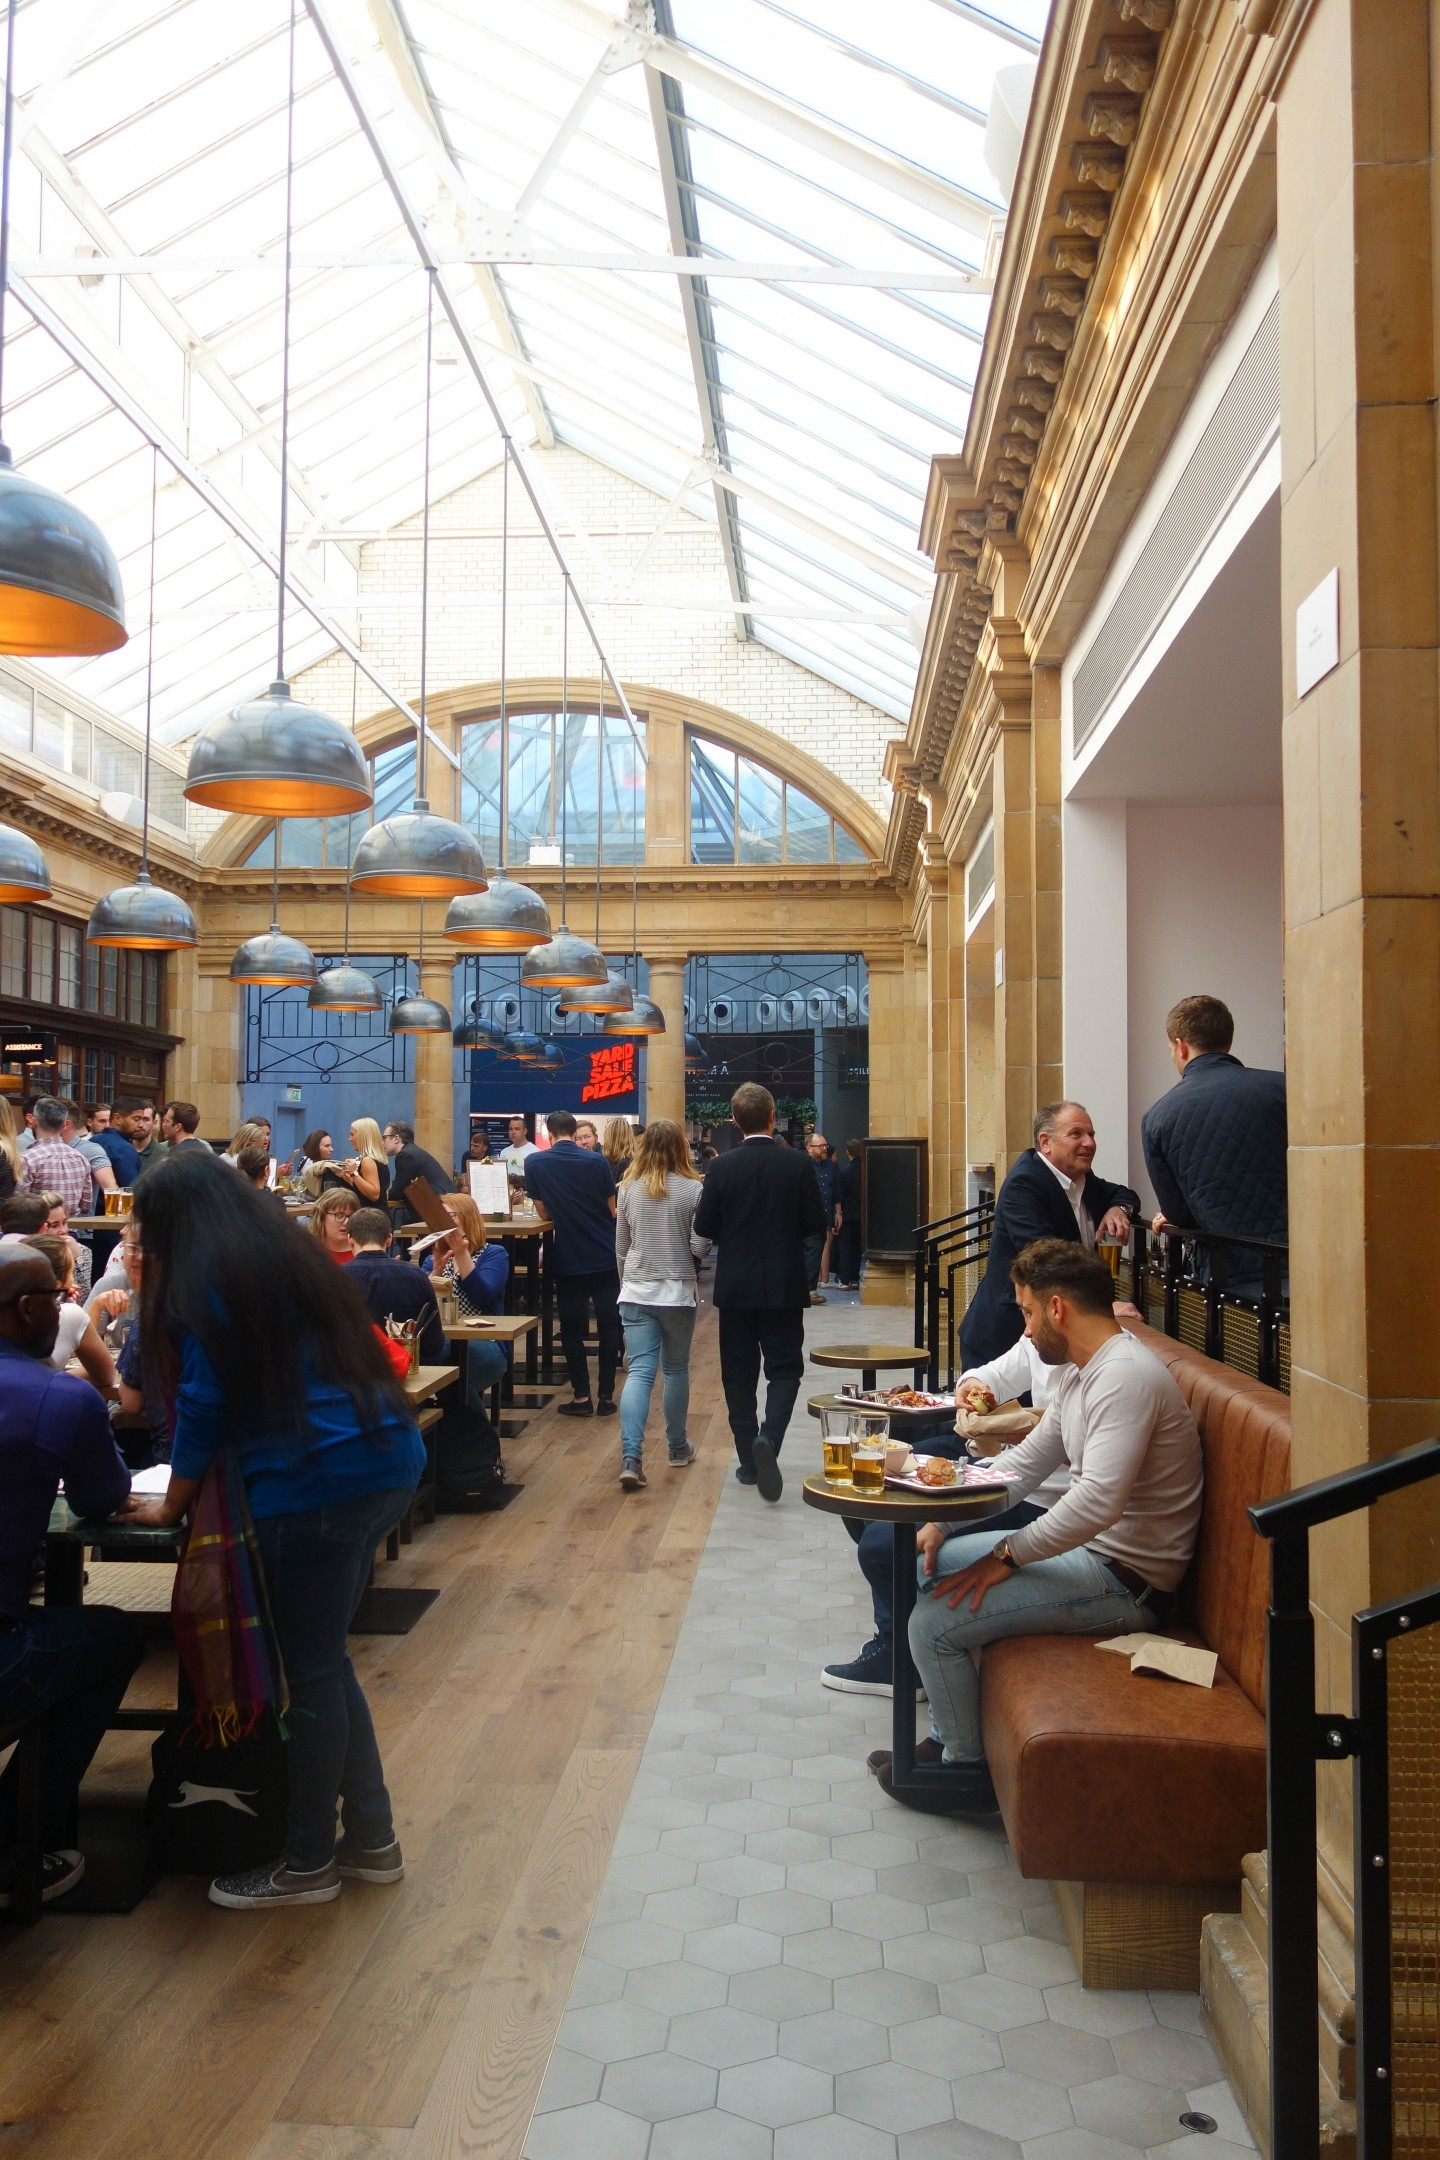 Market Halls, London - A New Indoor Food Market